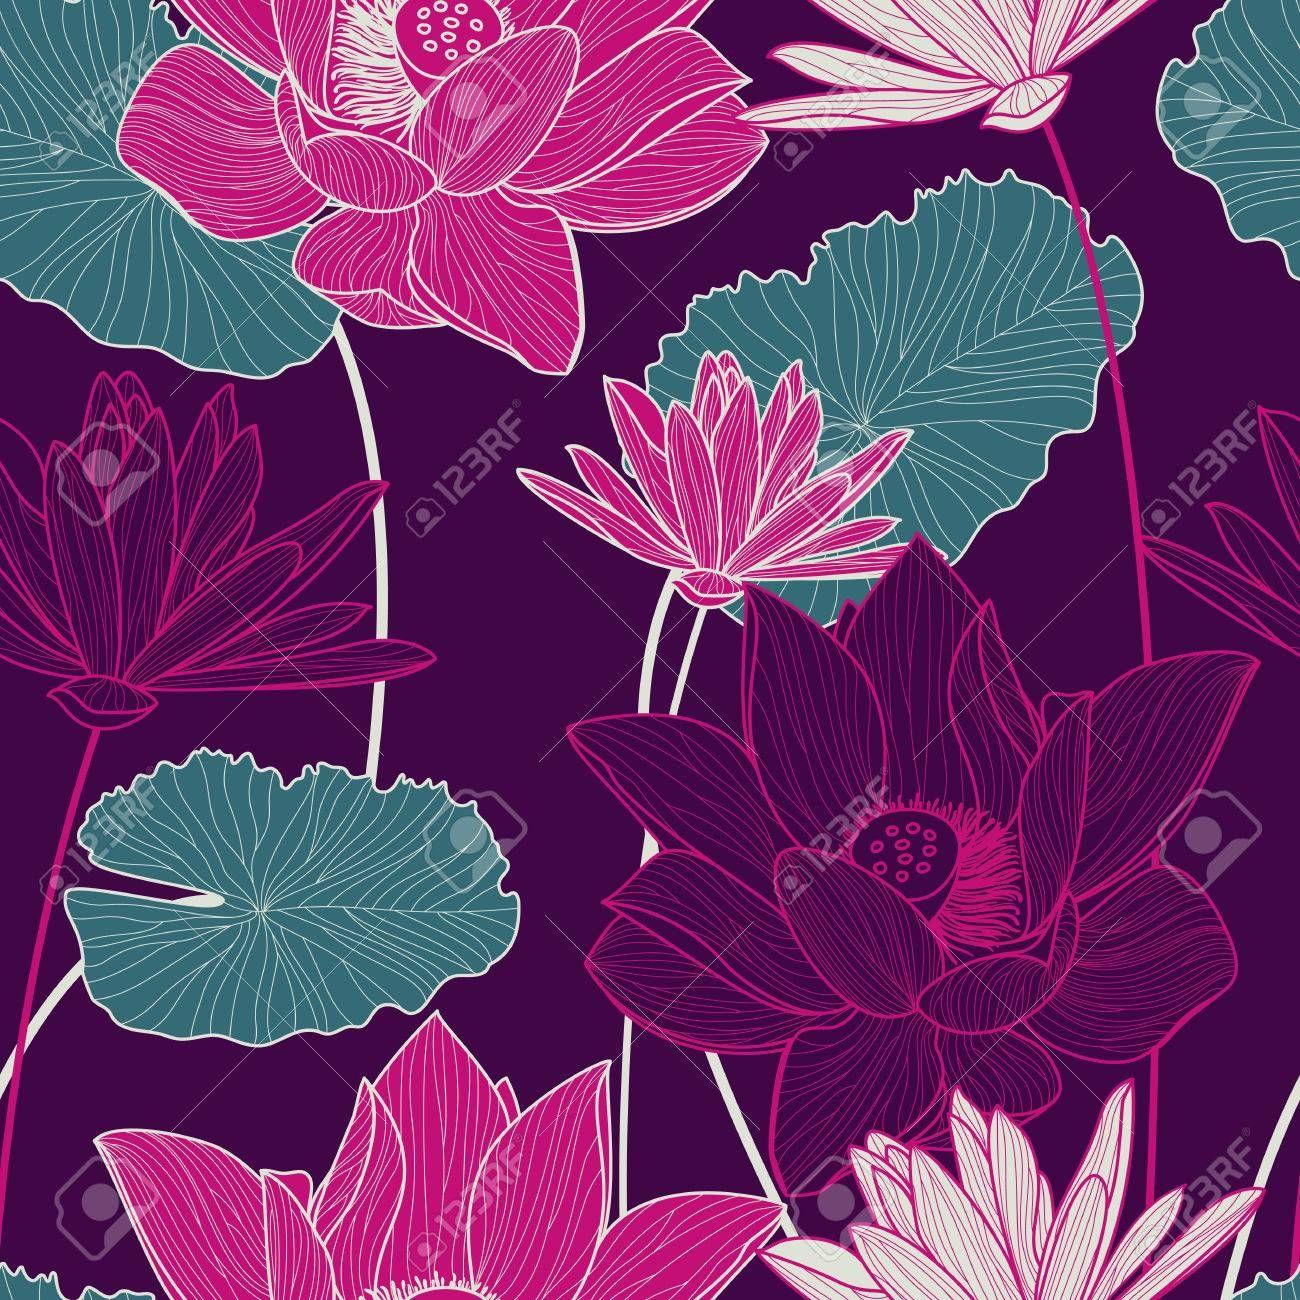 Pin by Lynn Peeler on Tropical plants Tropical flower